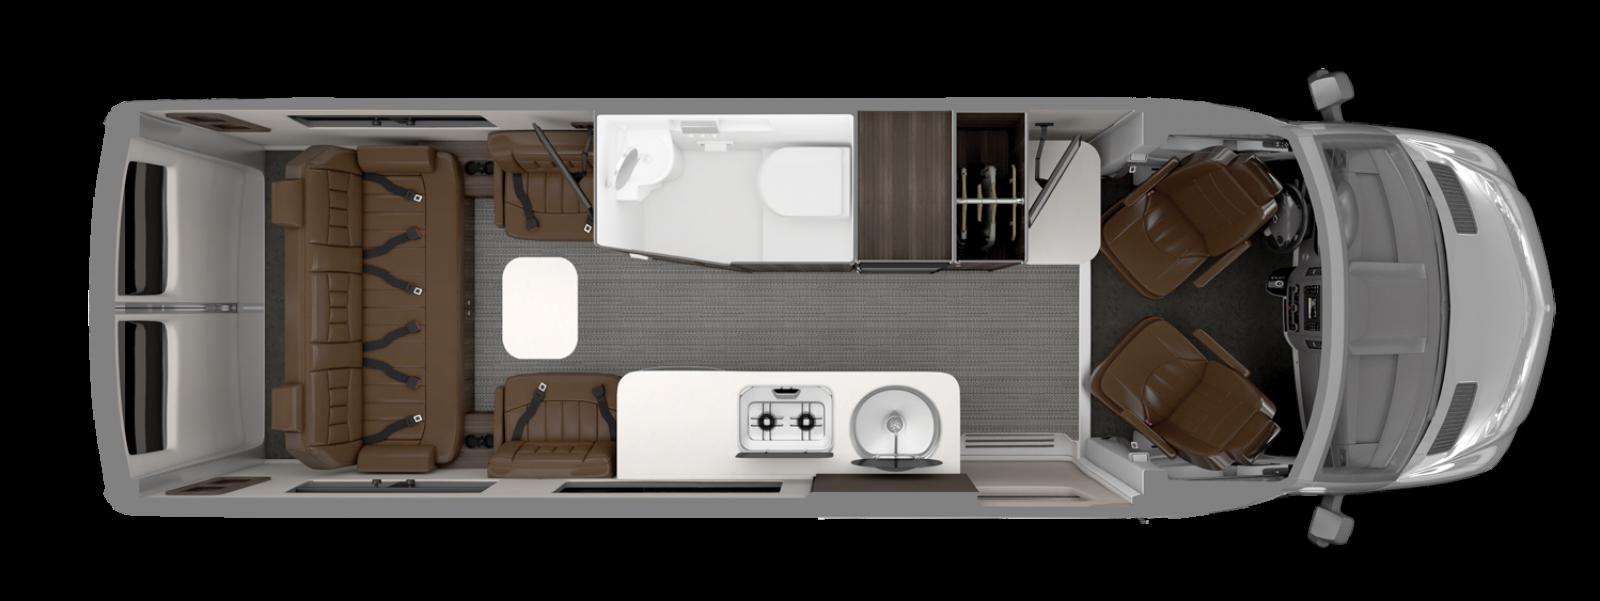 Interstate Grand Tour EXT Airstream Floorplan Refined Brown